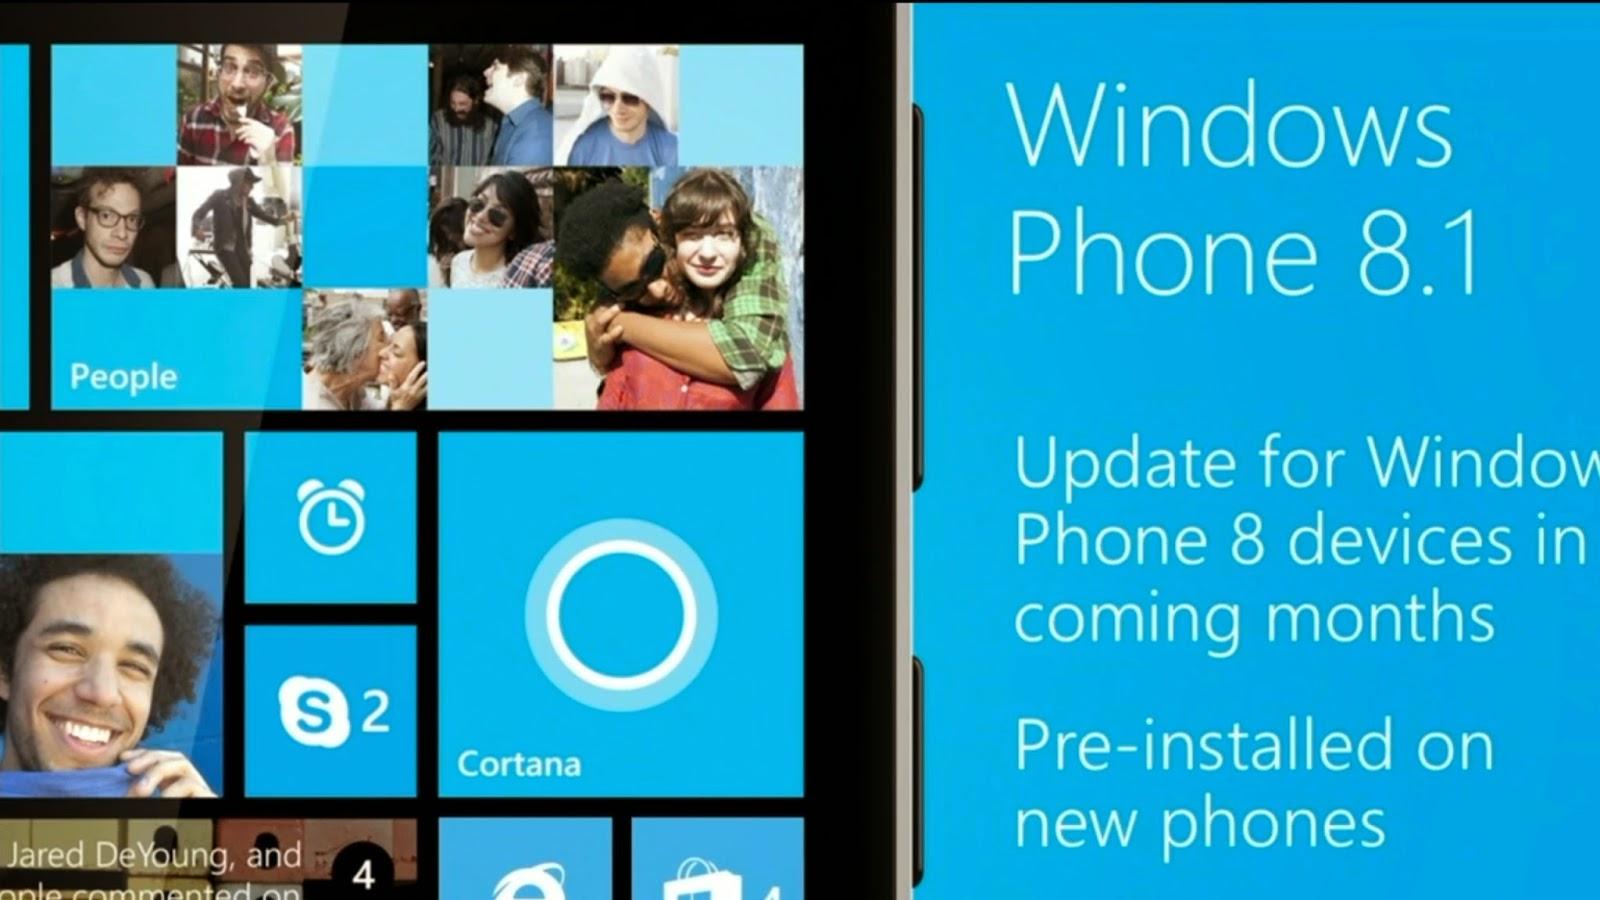 Yaz l m devi microsoft build etkinli inde windows phone 8 1